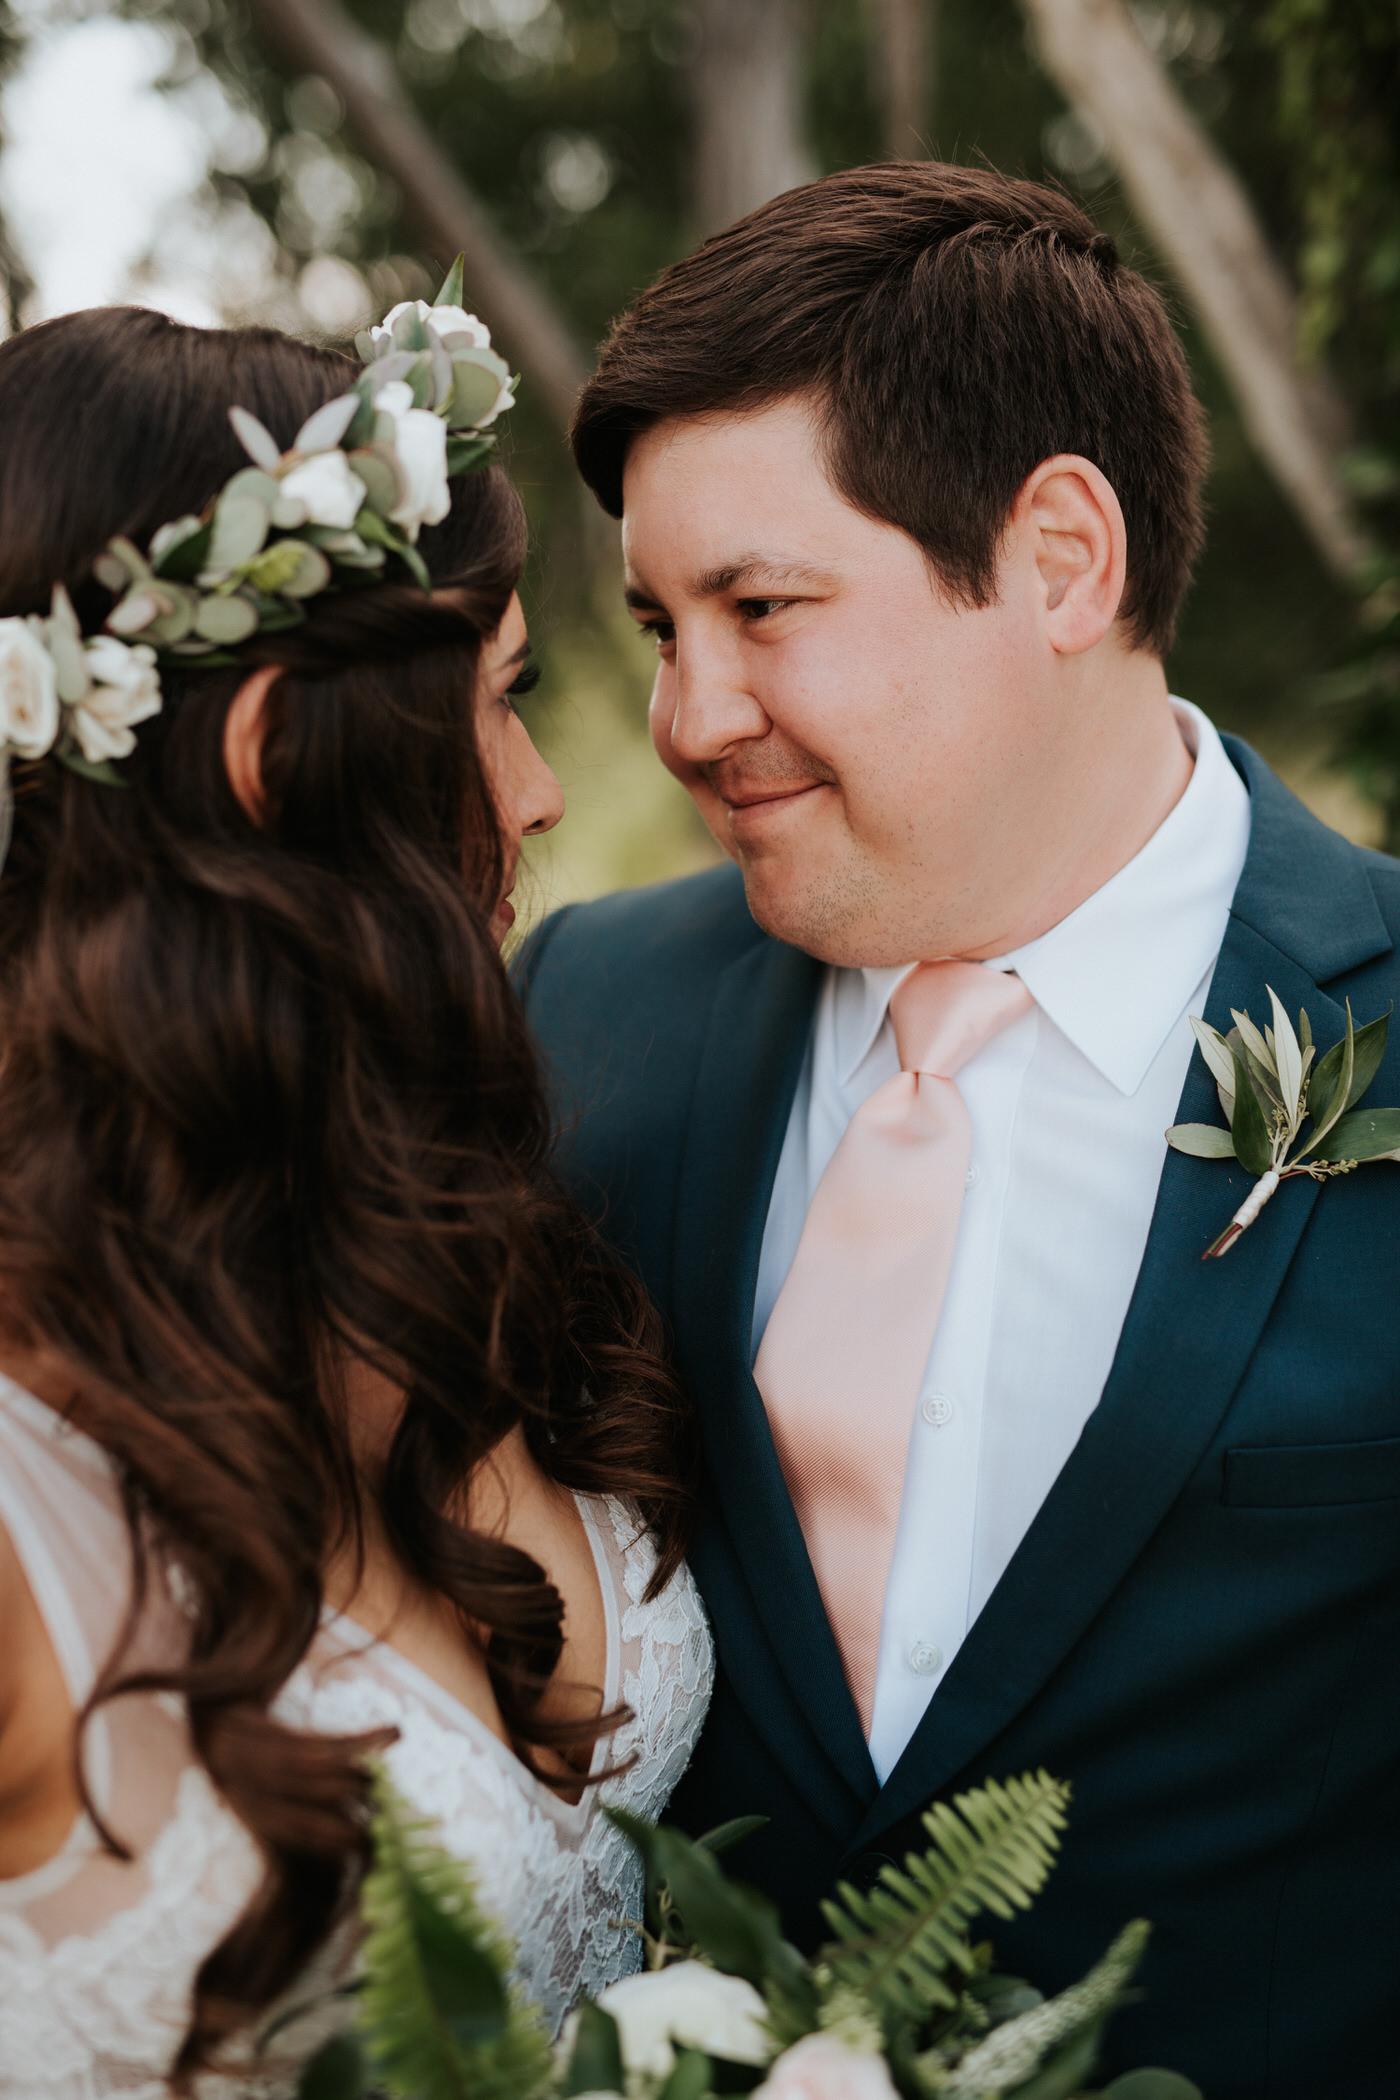 Thurman Mansion Wedding - Diana Ascarrrunz Photography -594.jpg